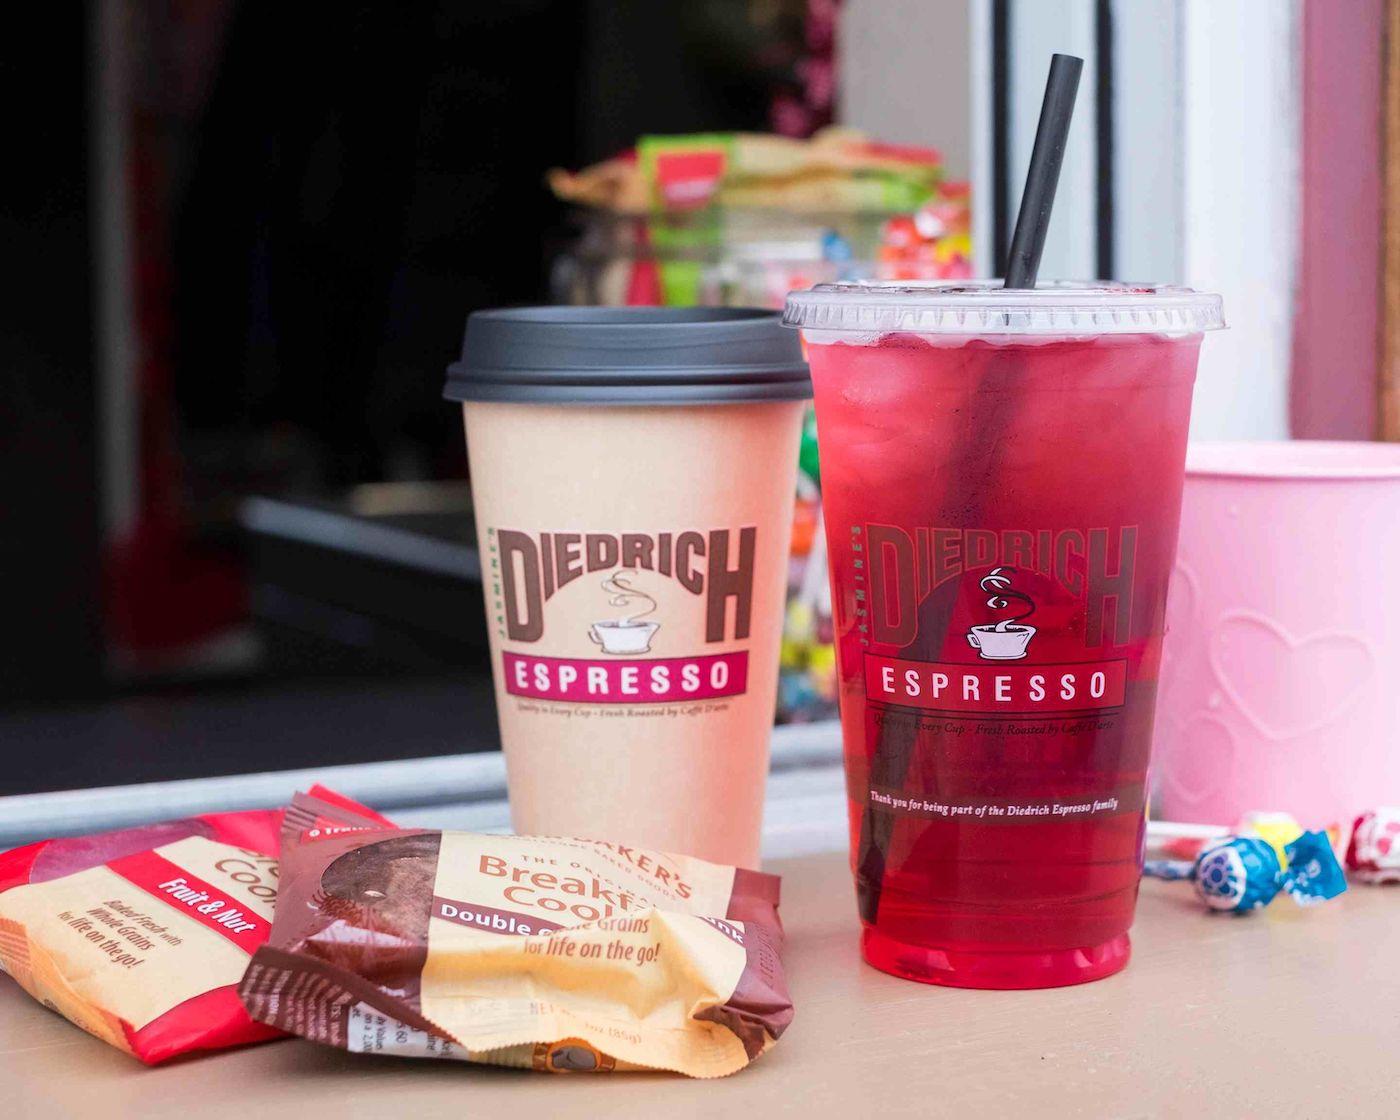 Drinks and snacks from Diedrich Espresso